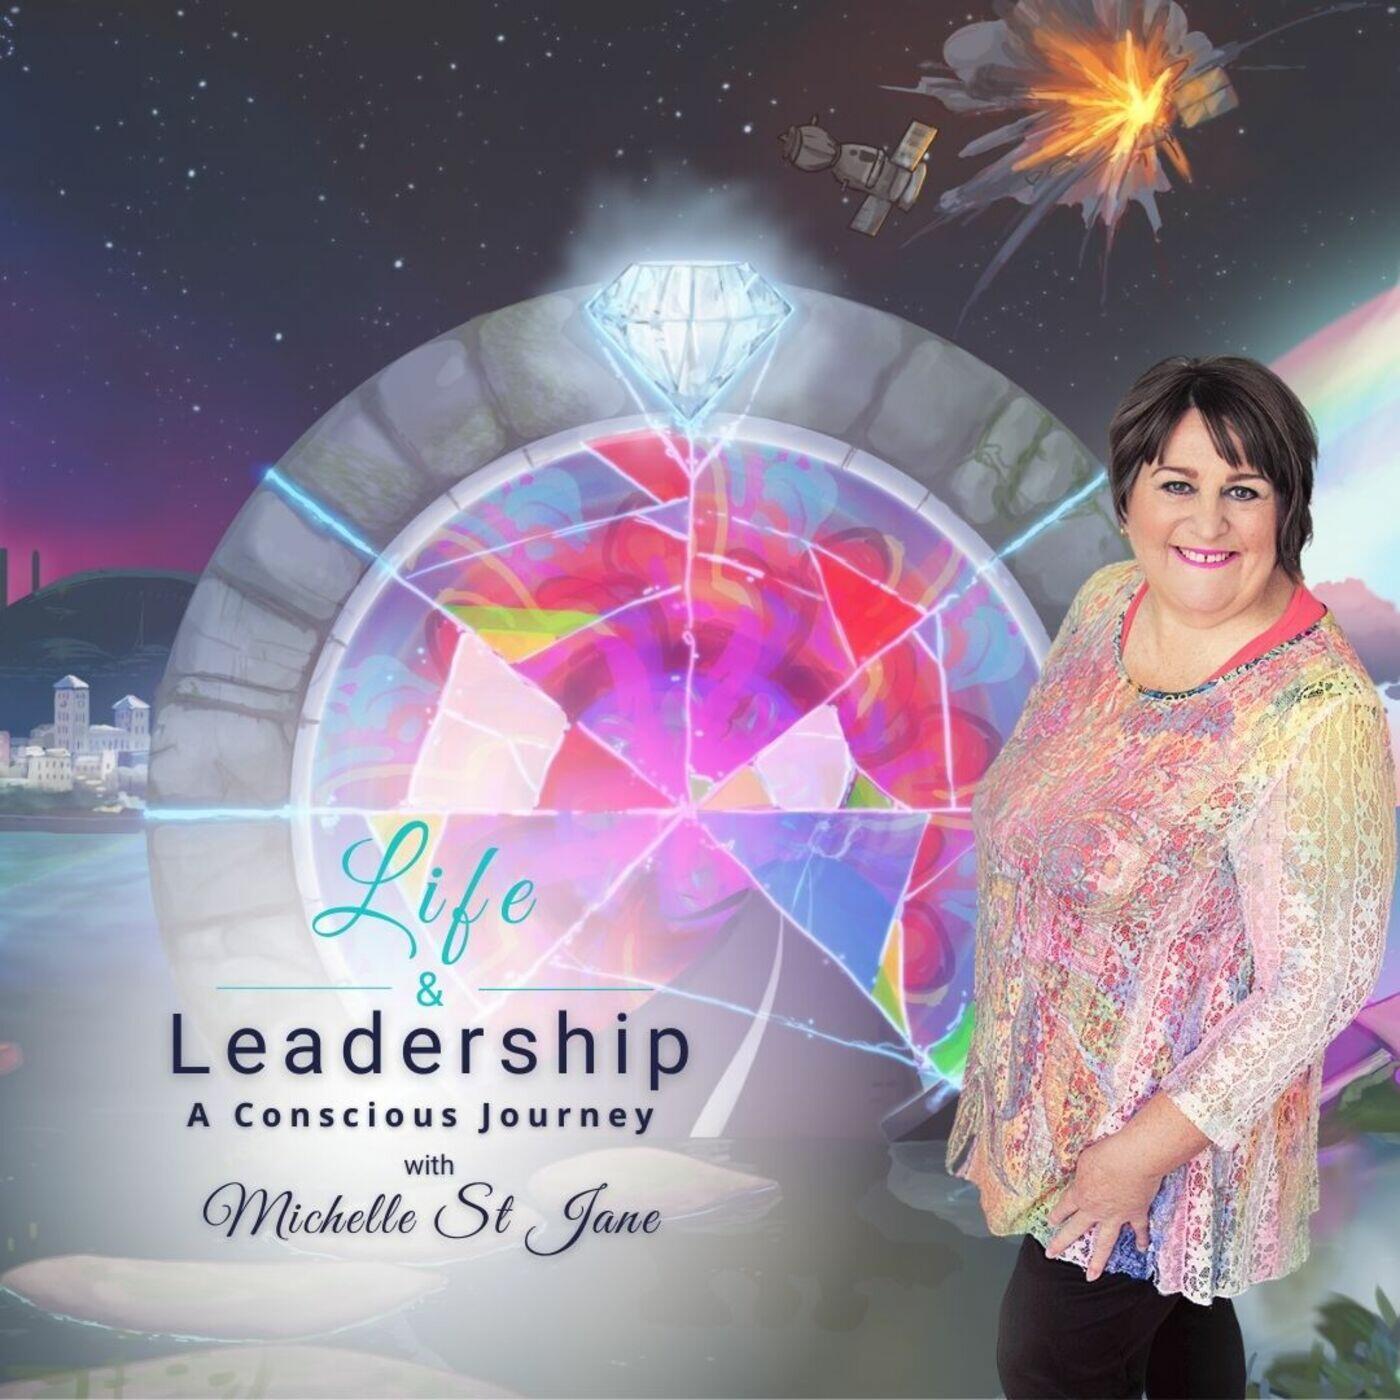 Life & Leadership: A Conscious Journey